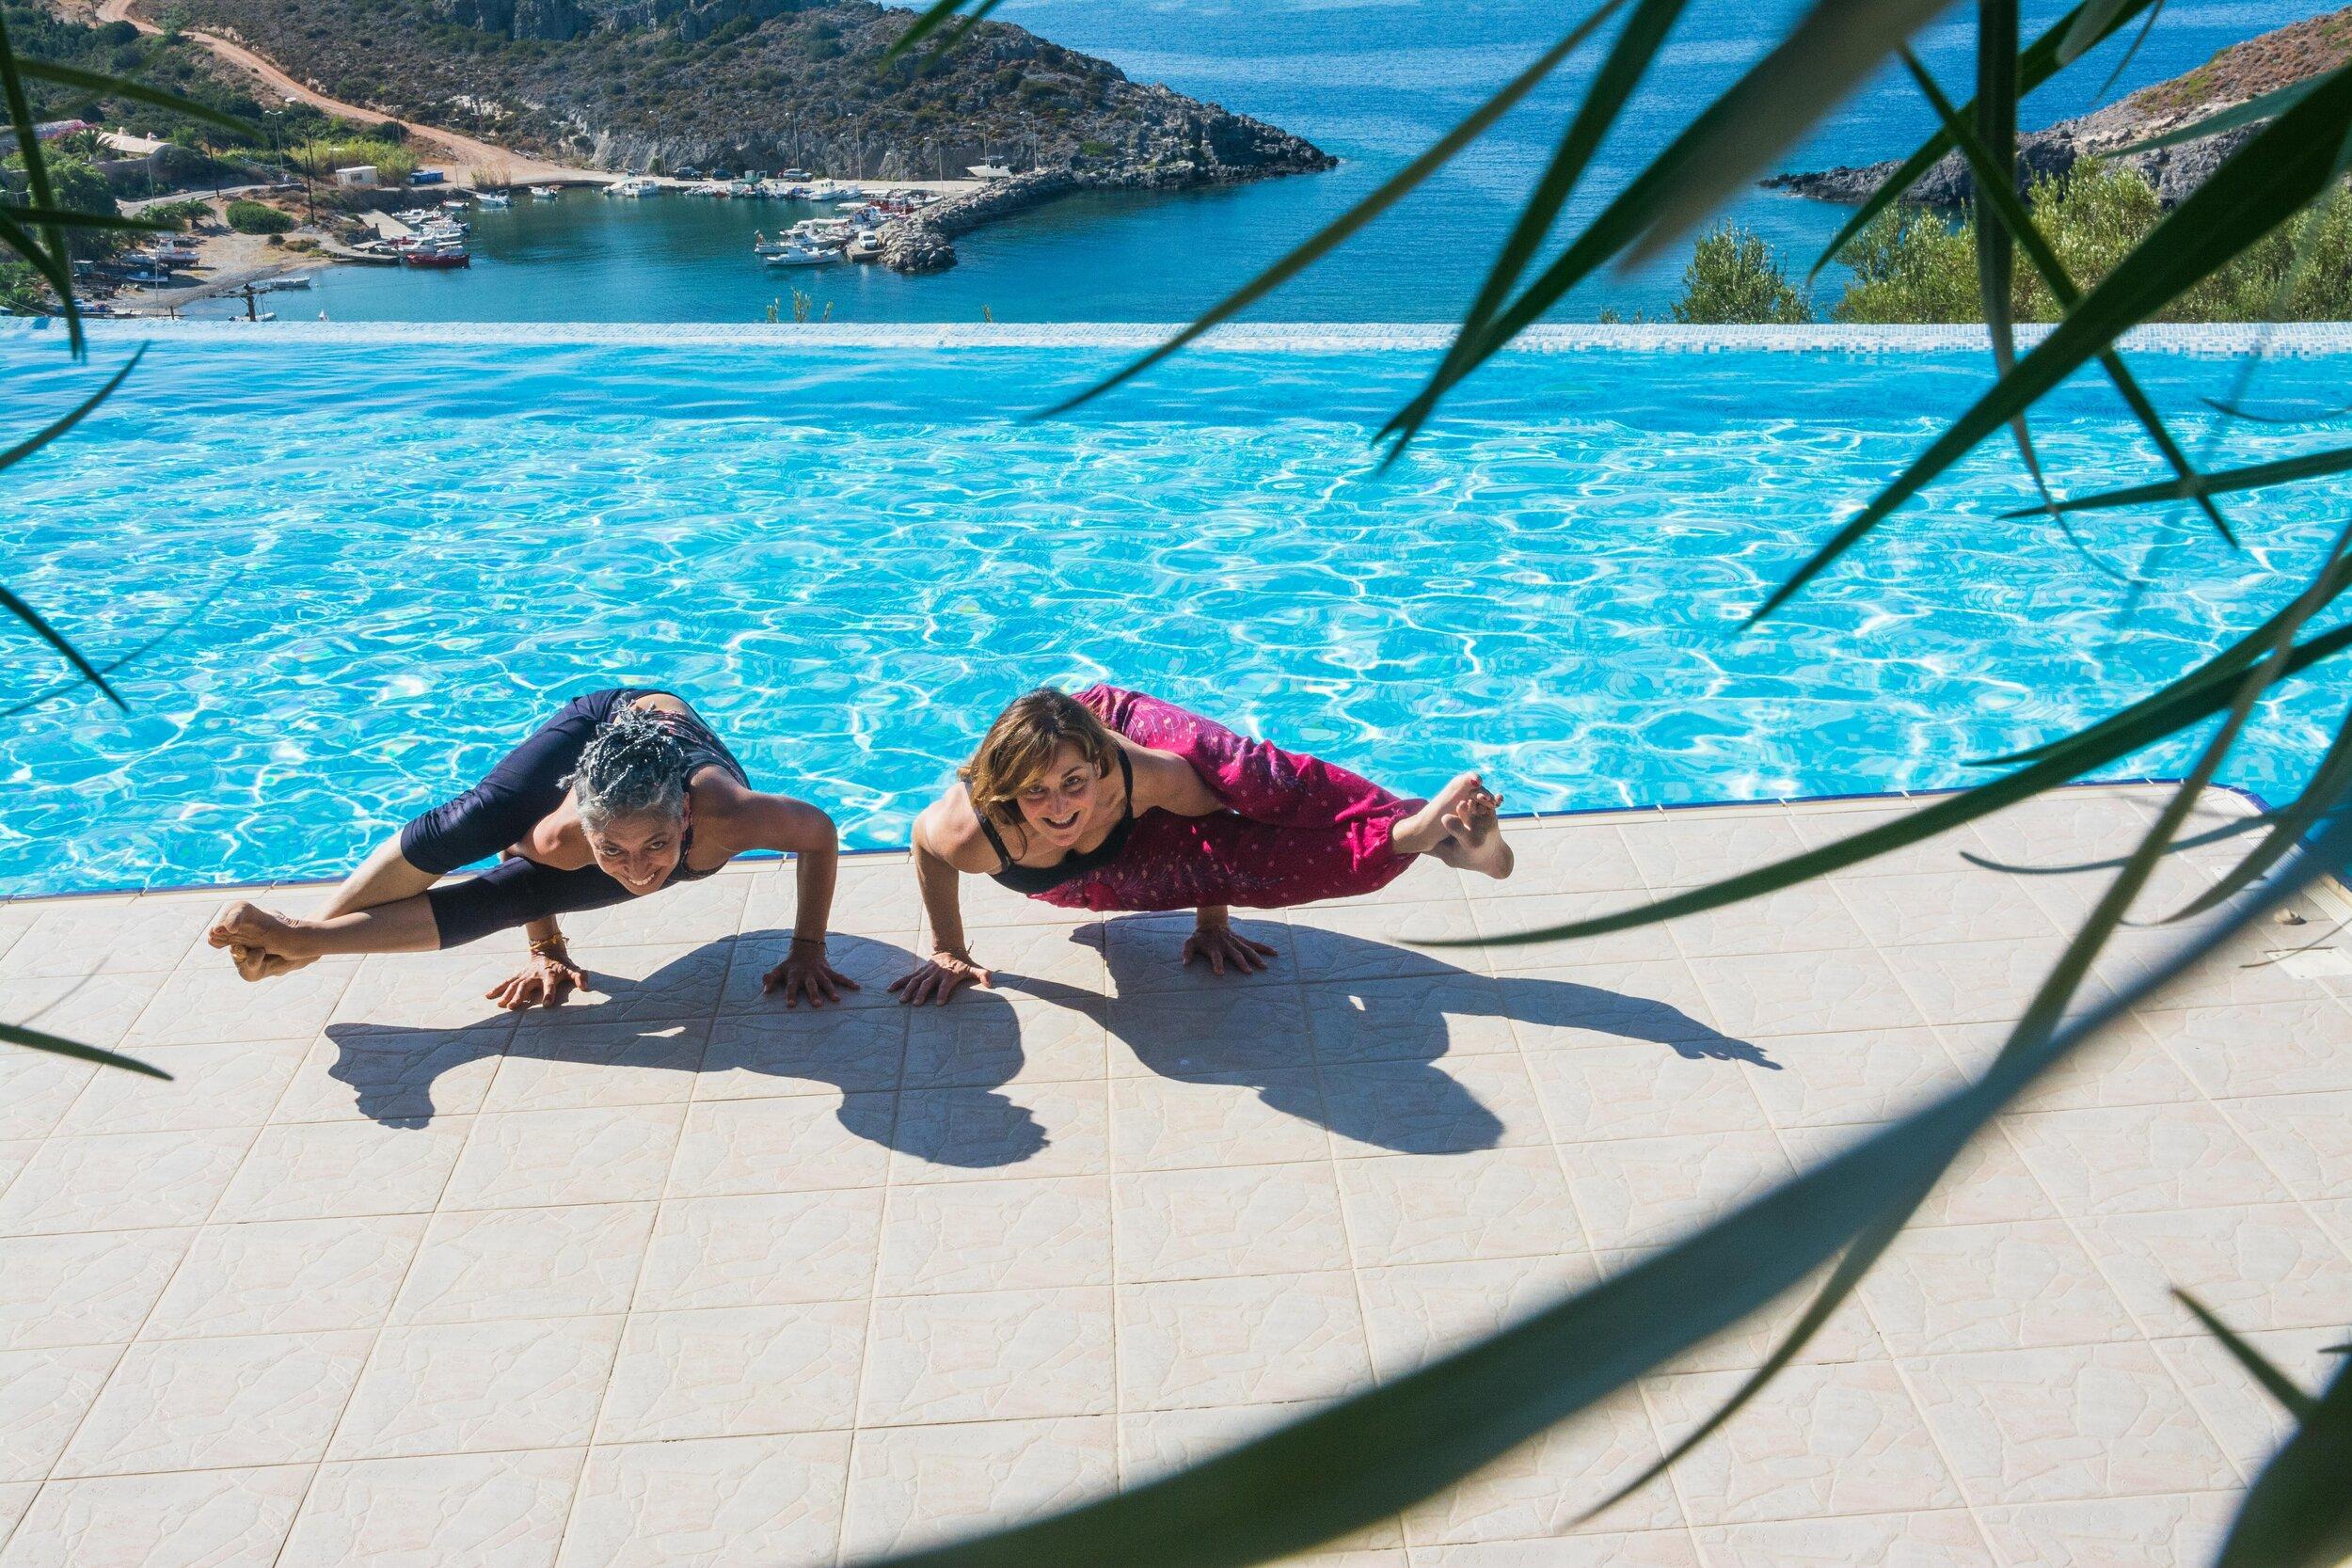 Yoga Teachers By The Pool.jpeg